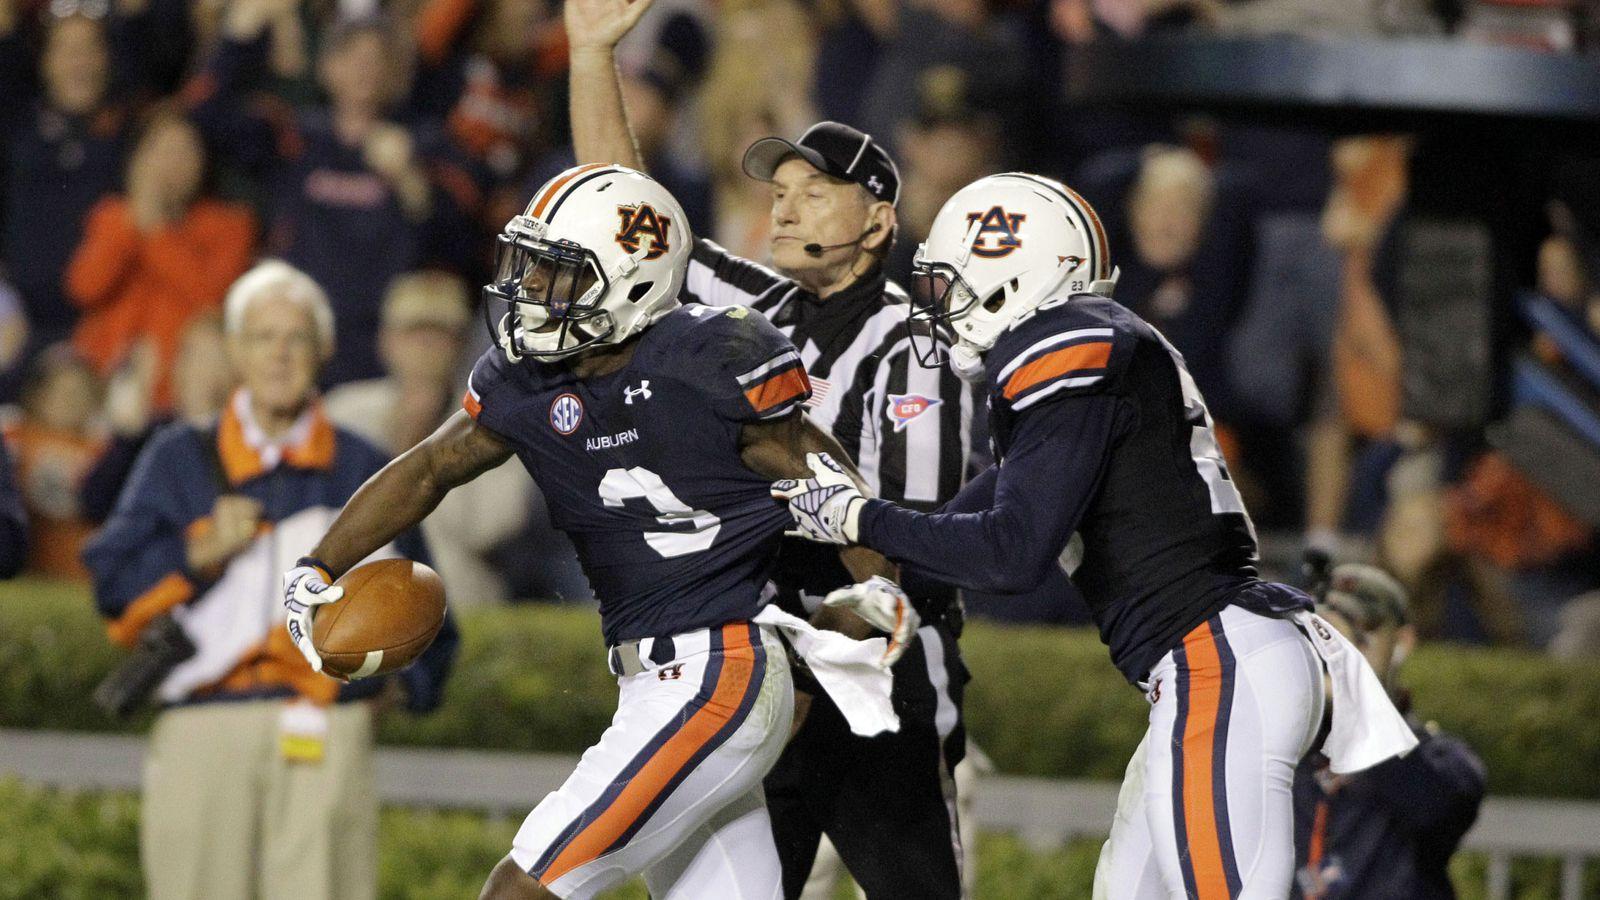 Auburn Vs South Carolina Recap The Tigers Hang On To A 42